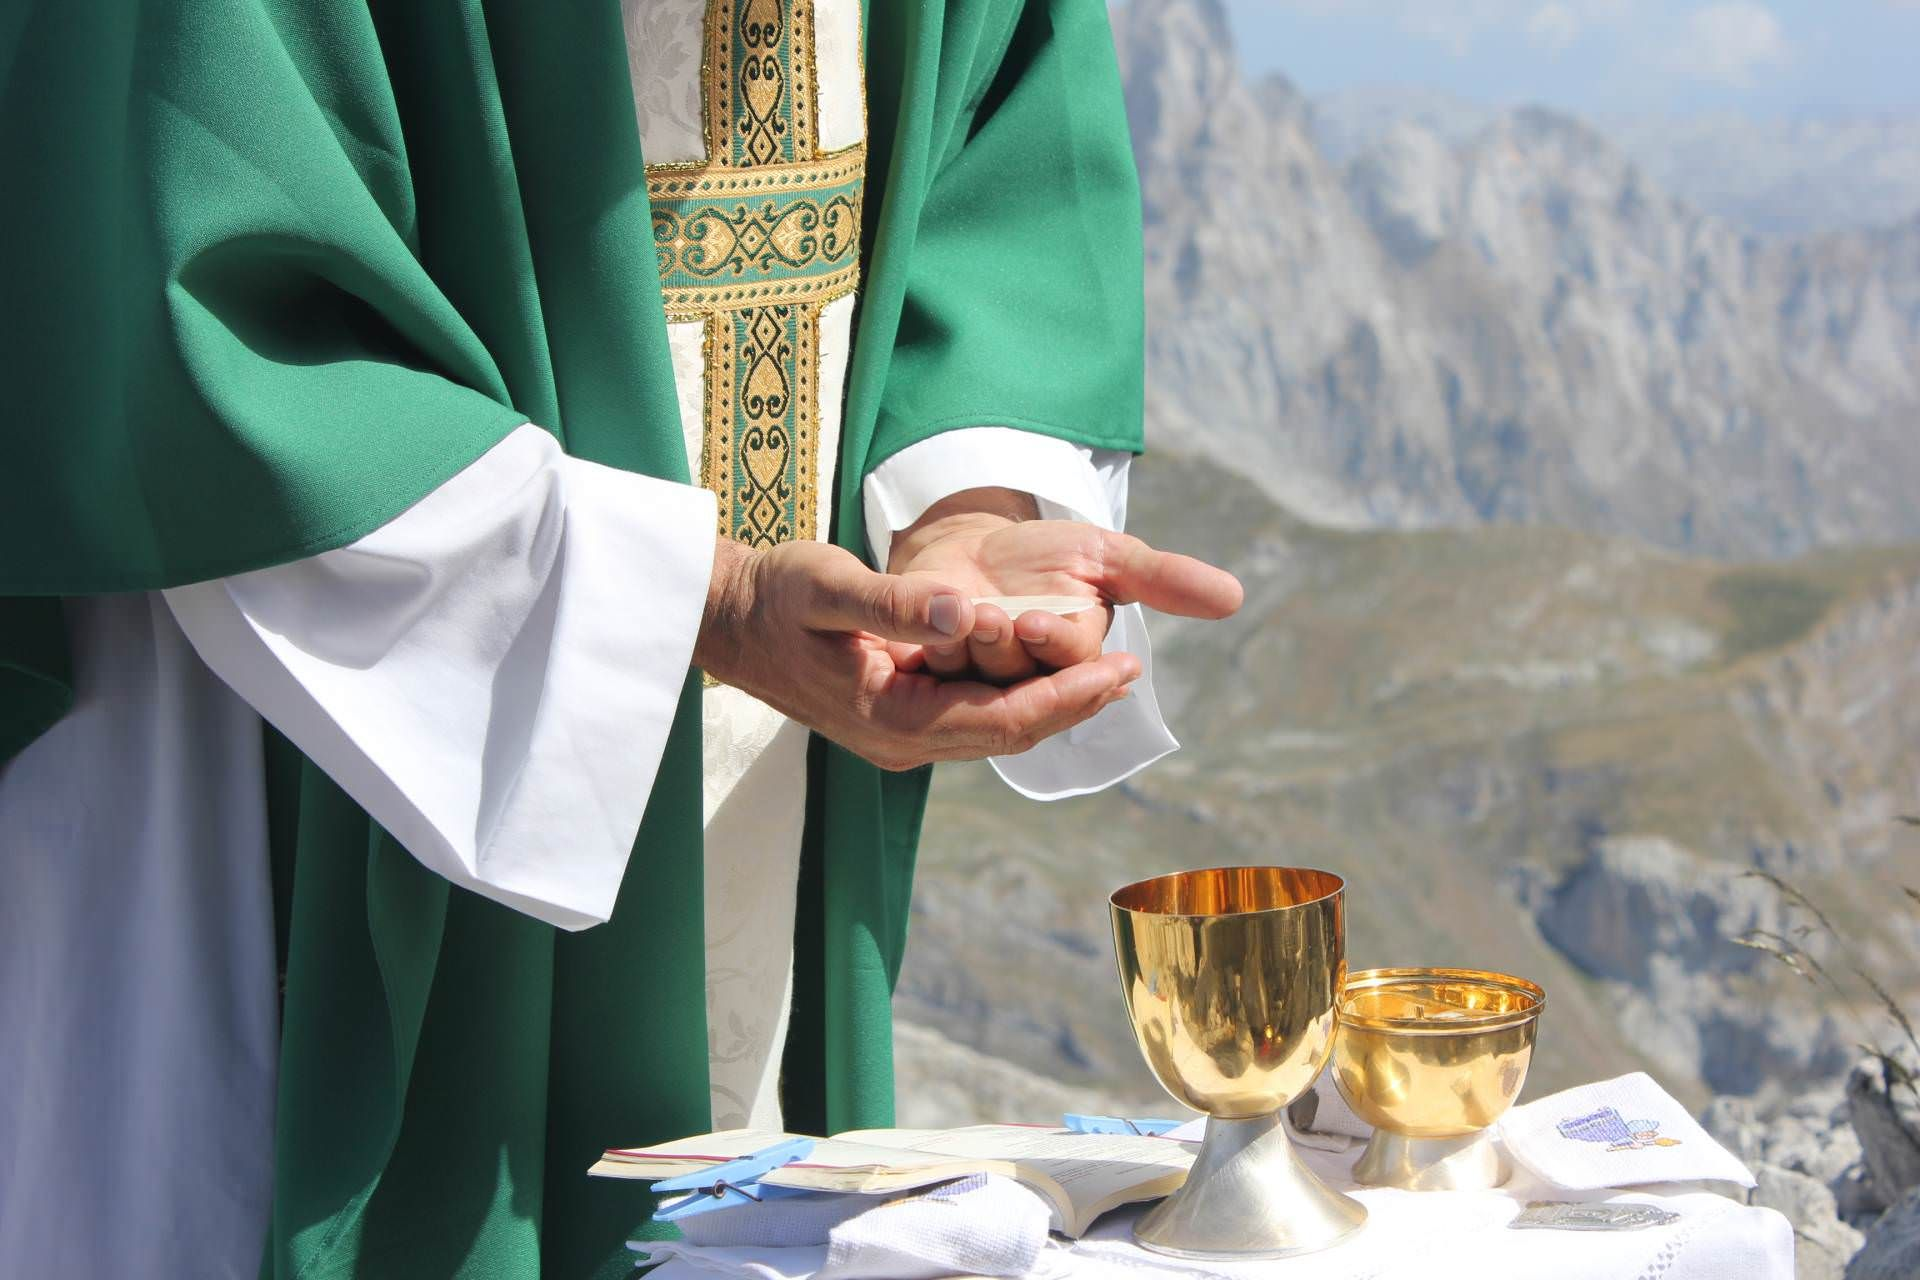 Imagen Católica: Misa, Eucaristia, Sacerdote, Hostia